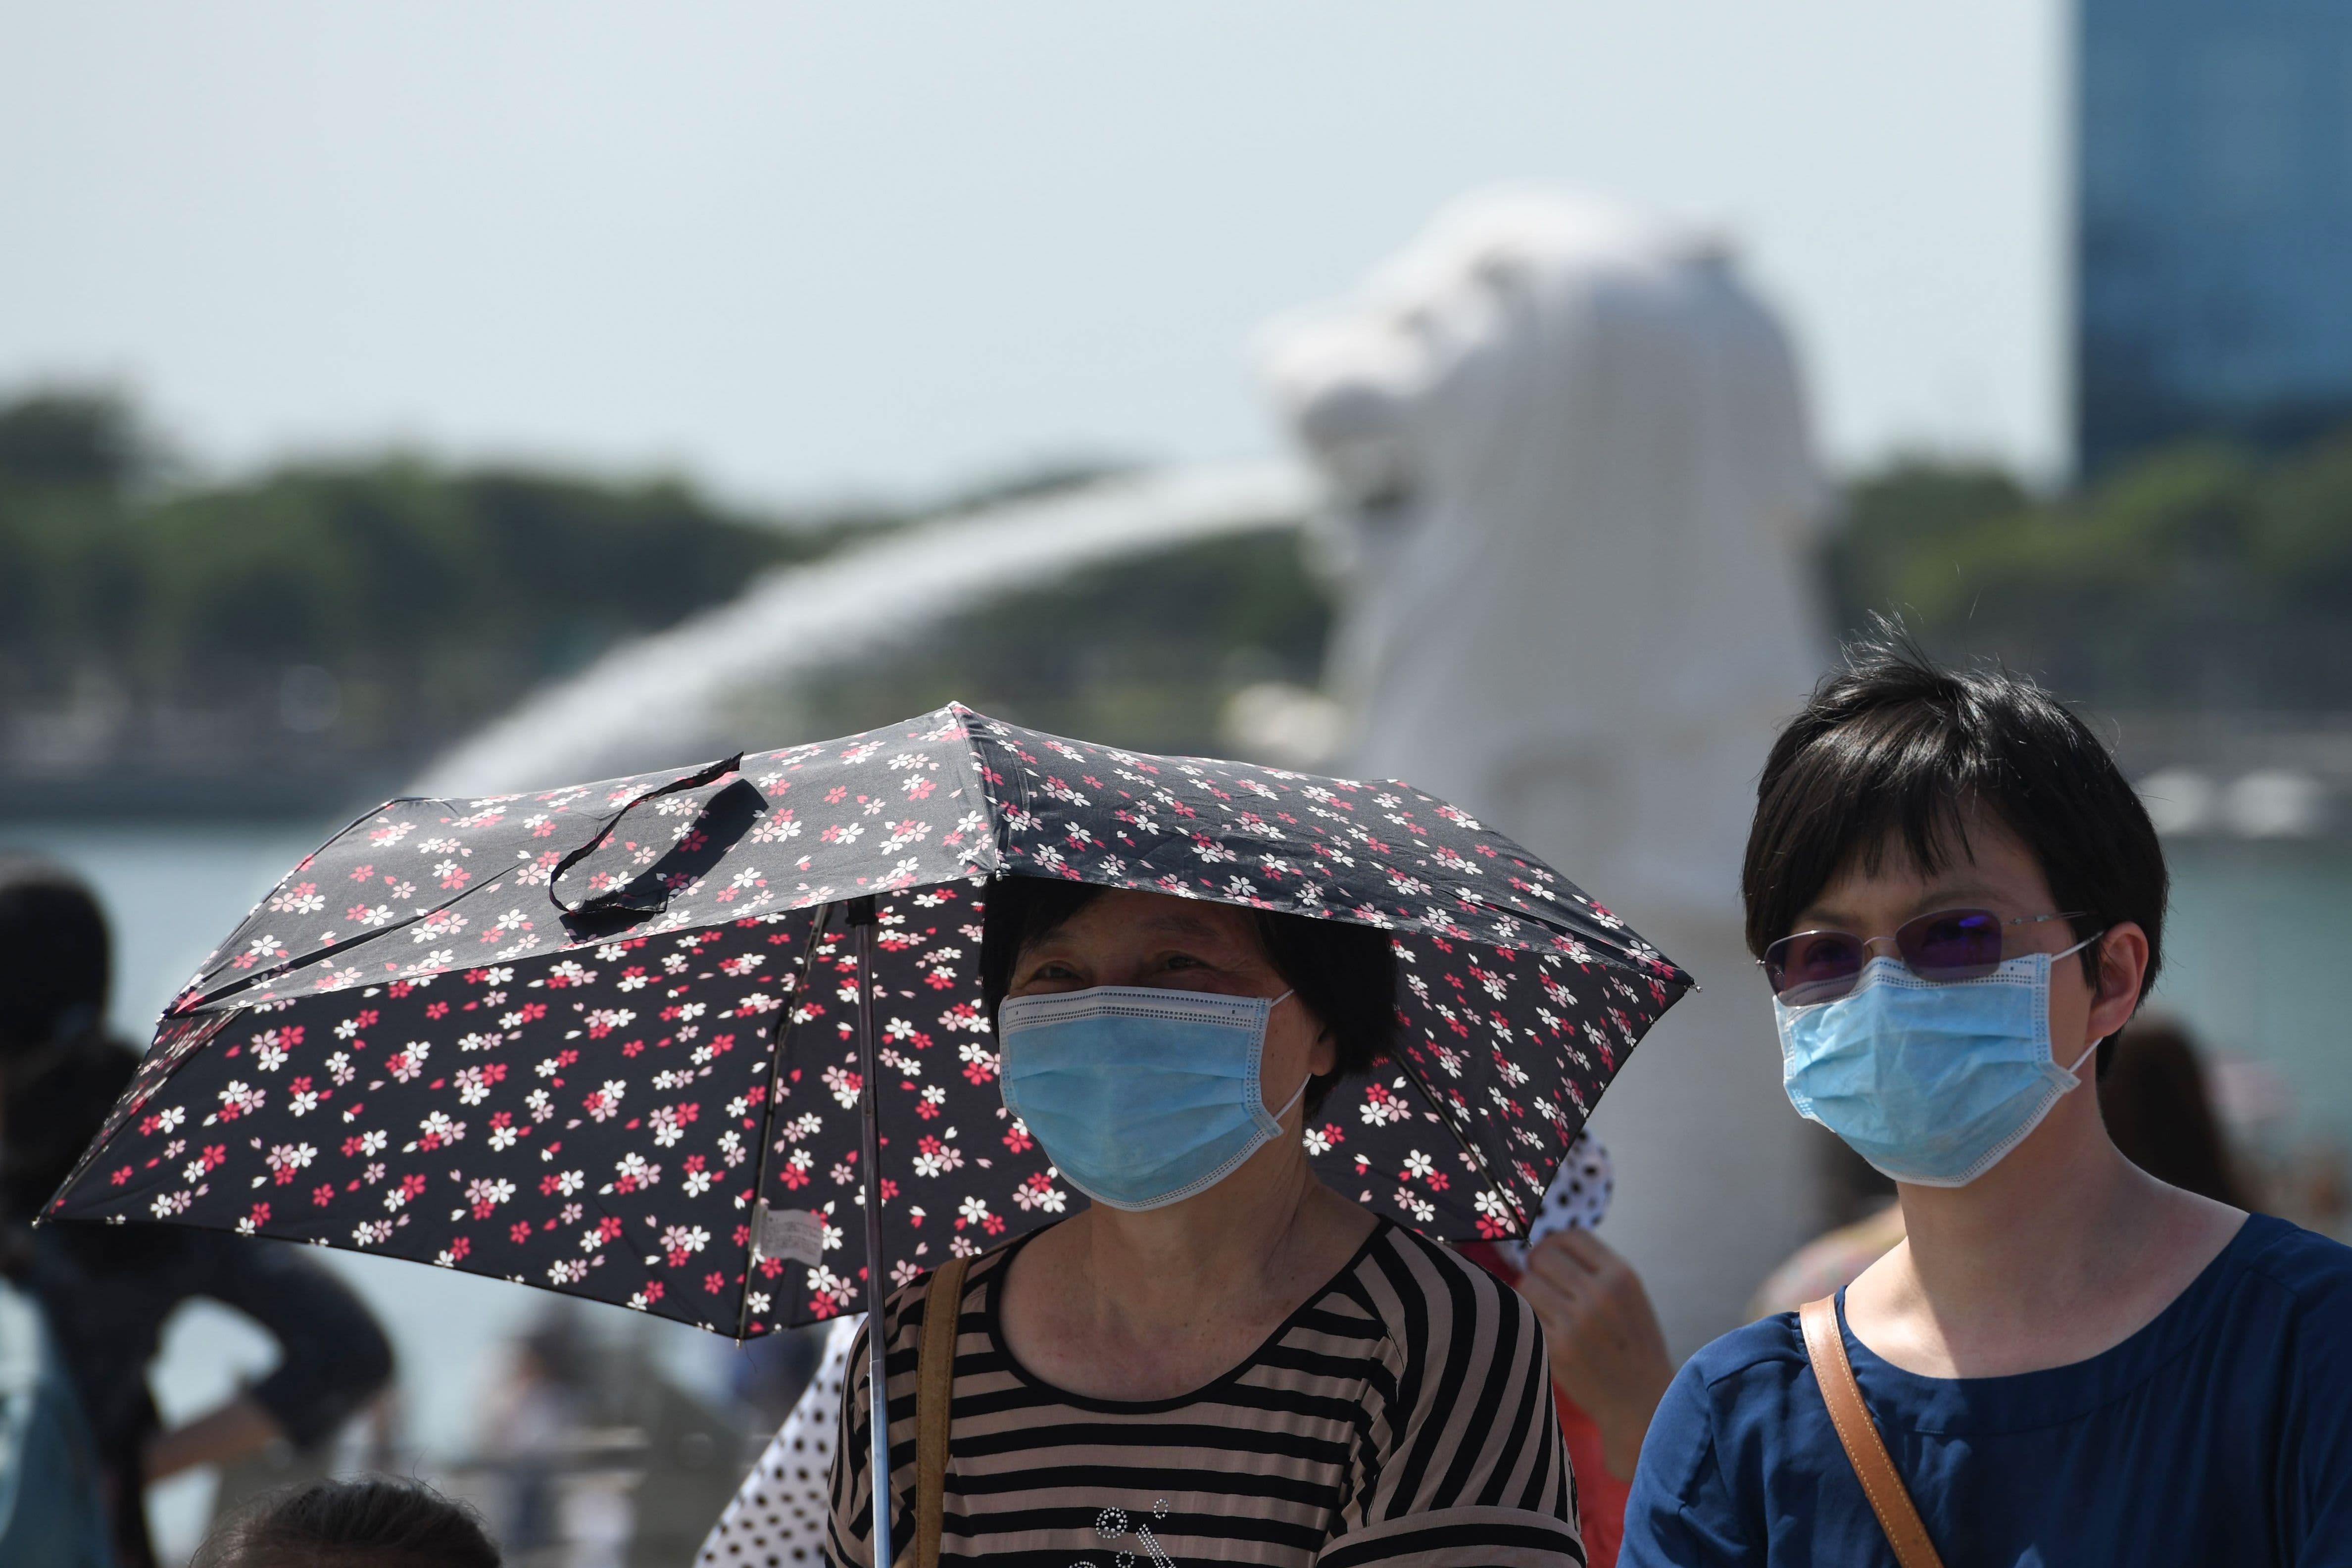 Singapore downgrades 2020 economic forecast amid coronavirus outbreak